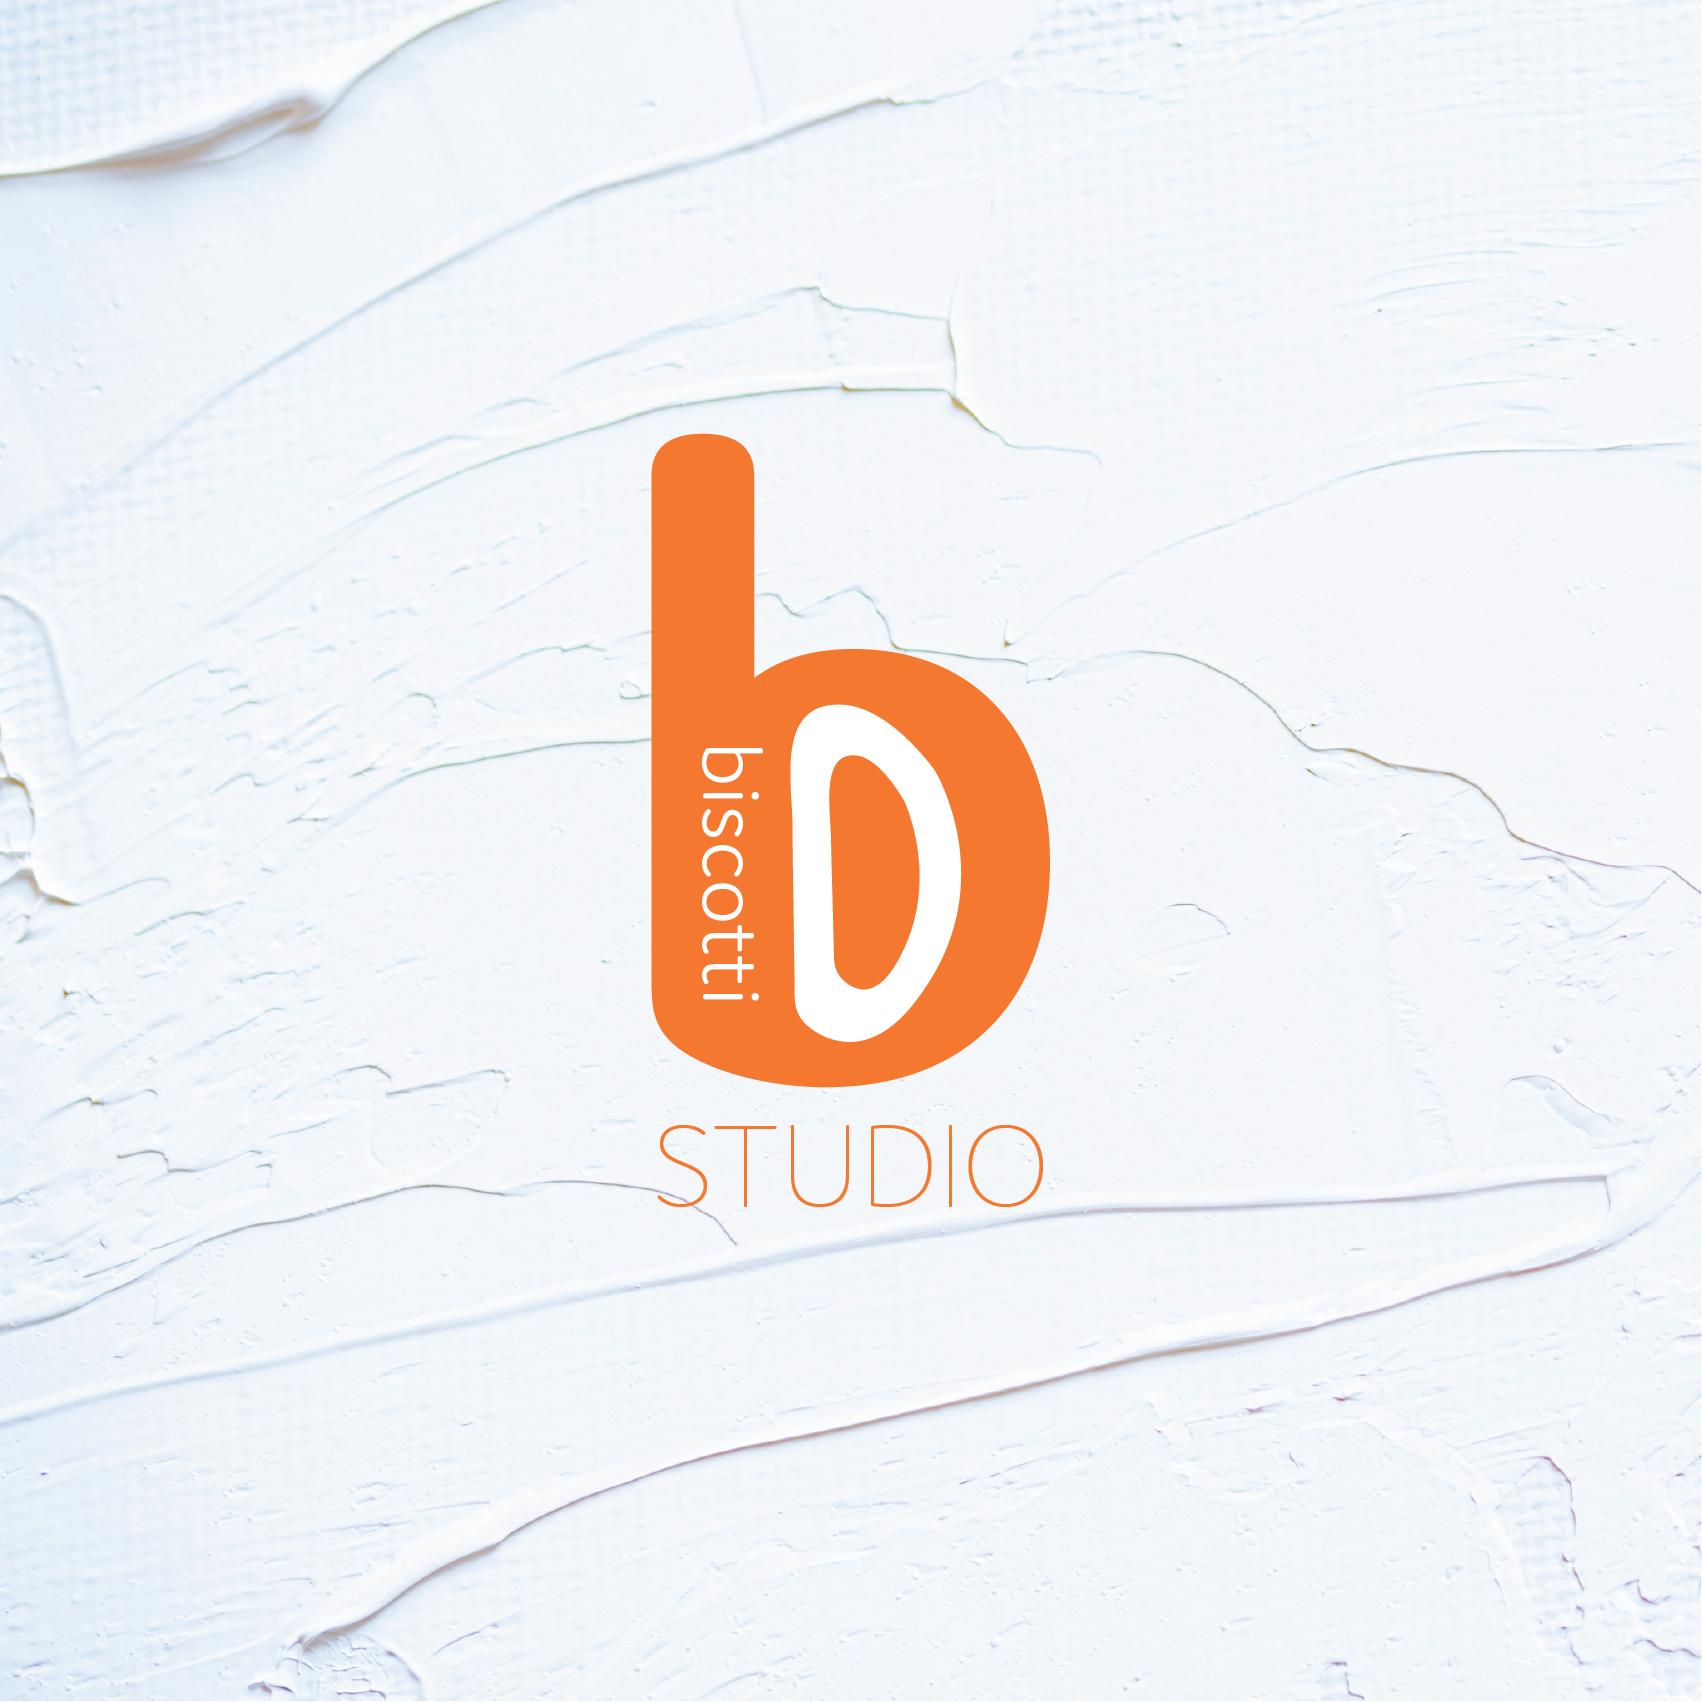 biscotti studio final-01.png